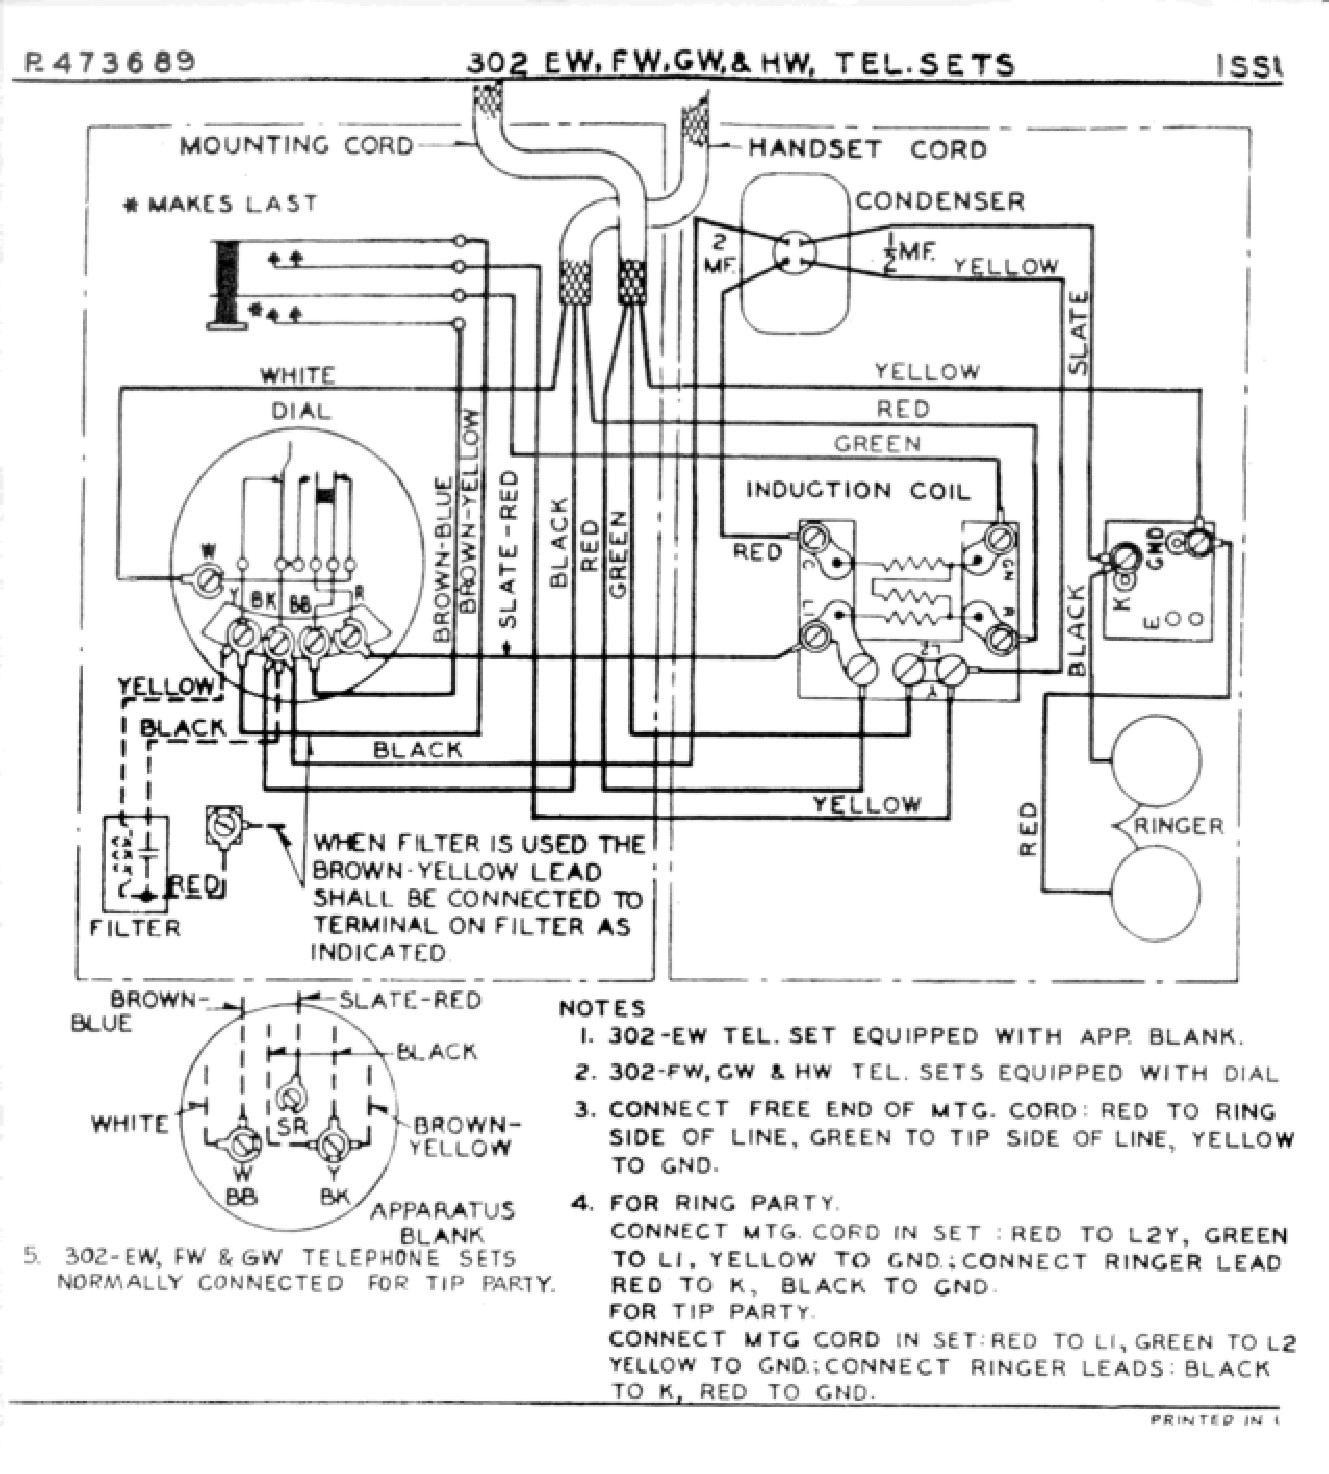 wiring 302 handset diagram